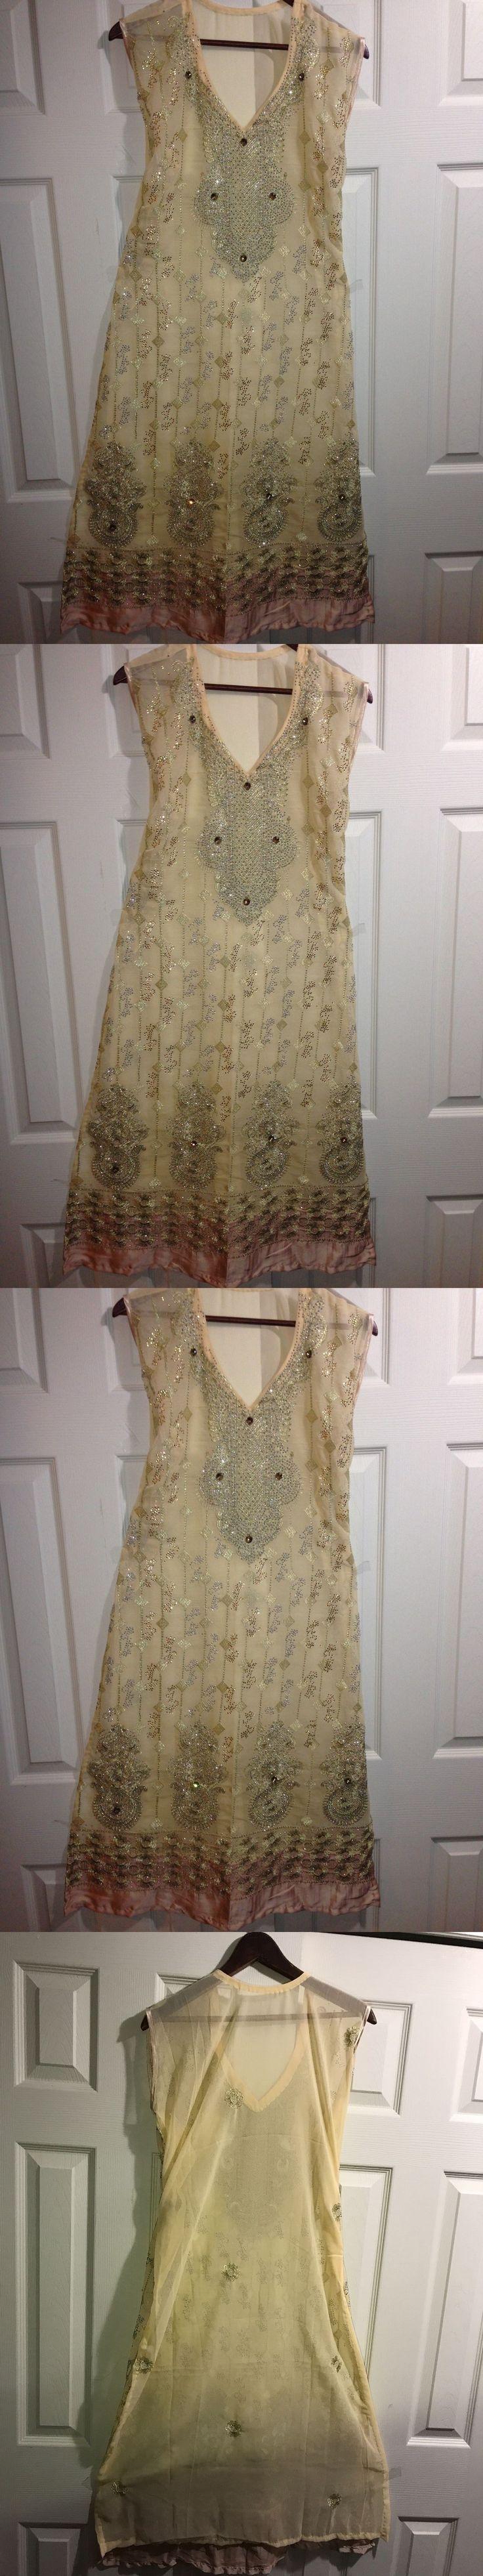 Salwar Kameez 155249: New Shalwar Kameez Cream Party Wedding Ethnic Fashion Wear Embroidery Size M -> BUY IT NOW ONLY: $45 on eBay!